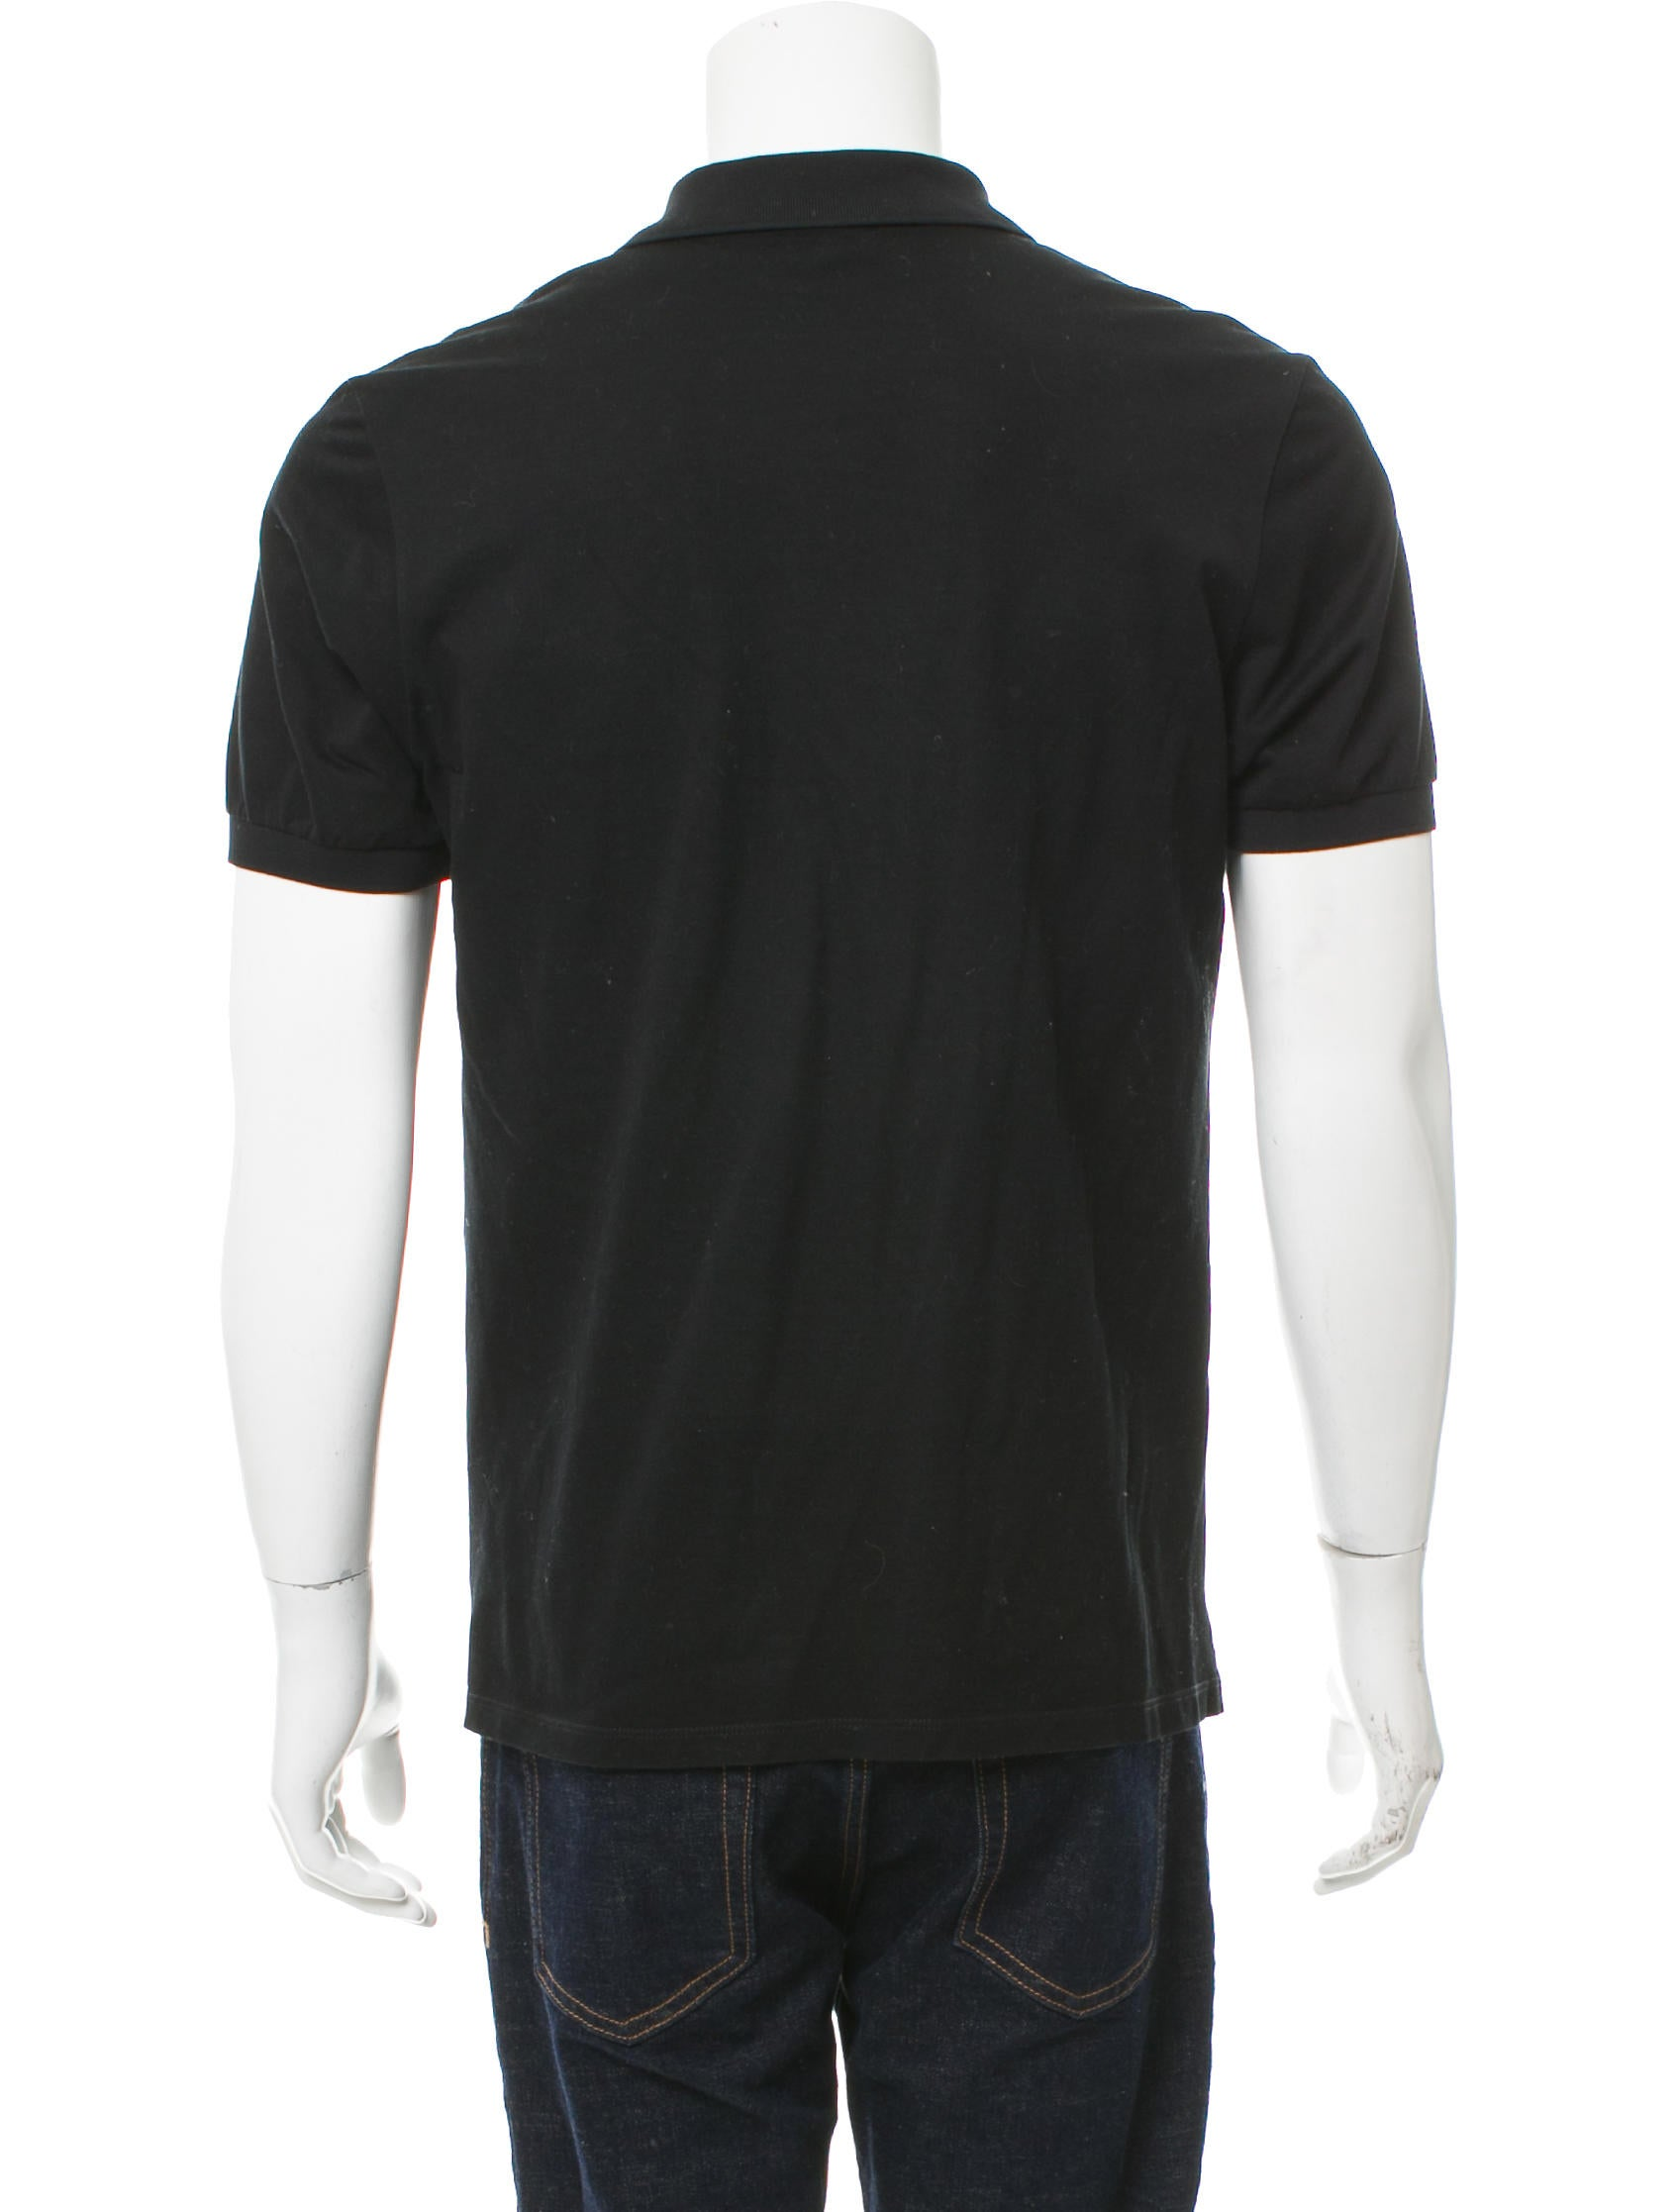 Lanvin Silk Accented Polo Shirt Clothing Lan67168